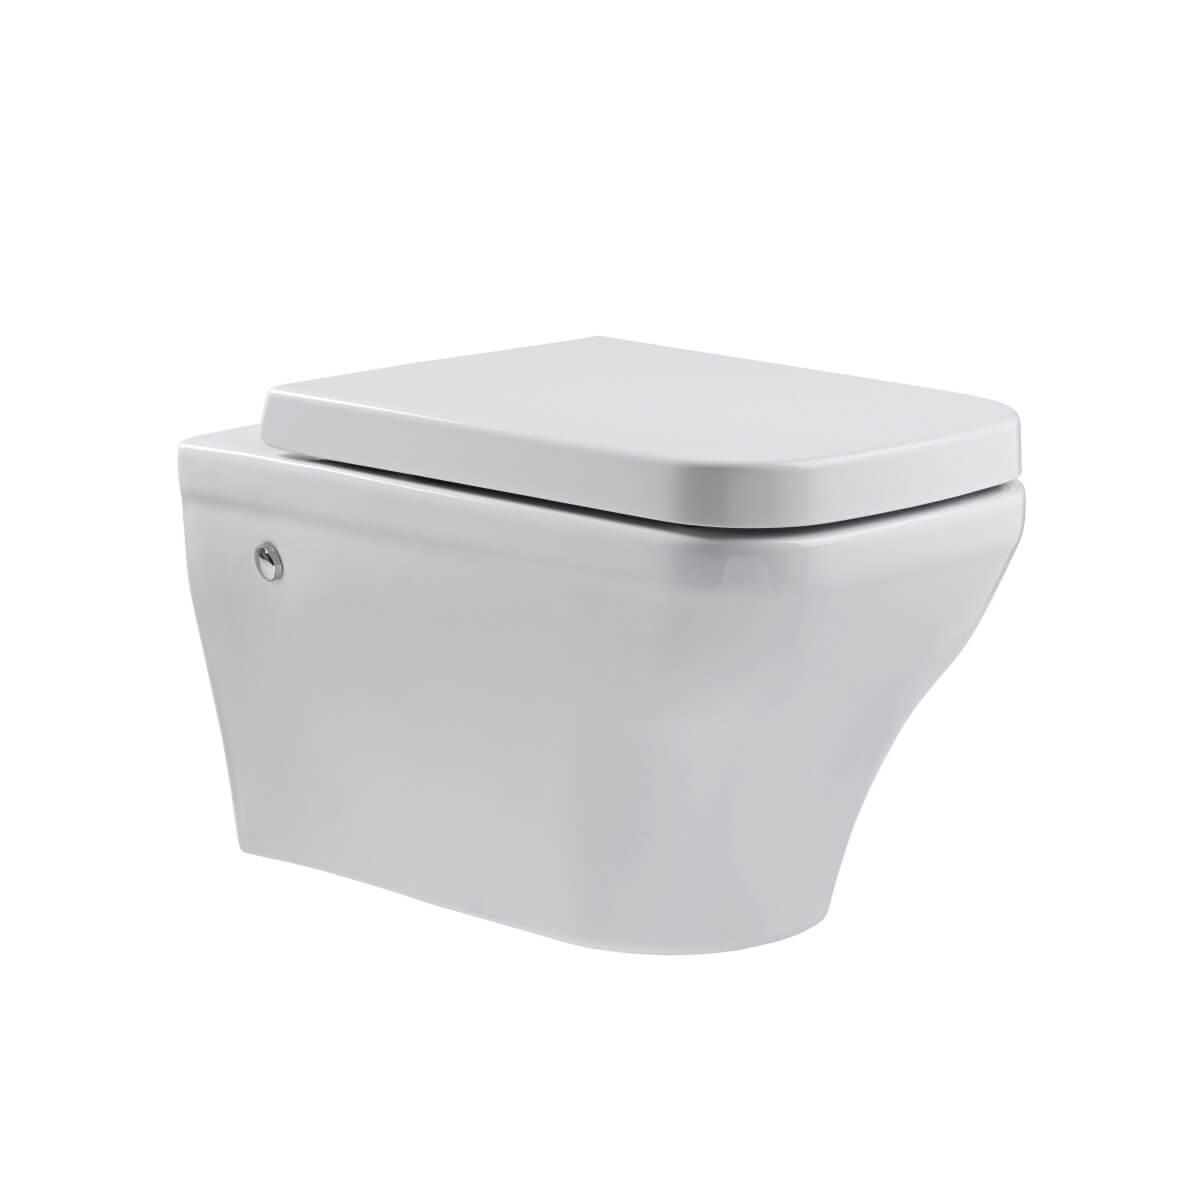 Roper Rhodes Wall Hung Toilets